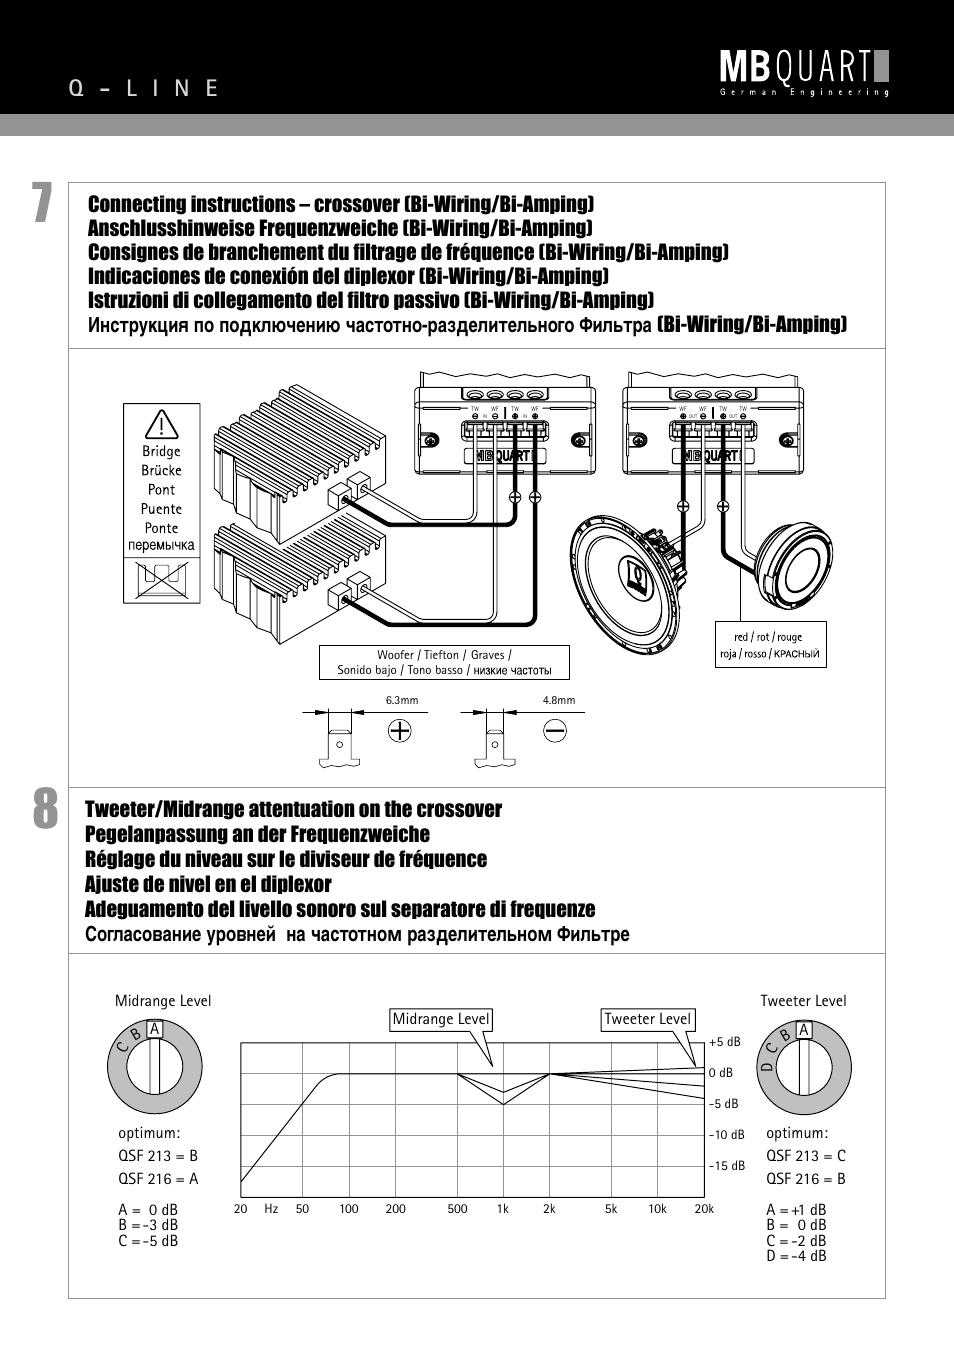 Q - l i n e   MB QUART Q - LINE QSF 213 User Manual   Page 2 / 9Manuals Directory